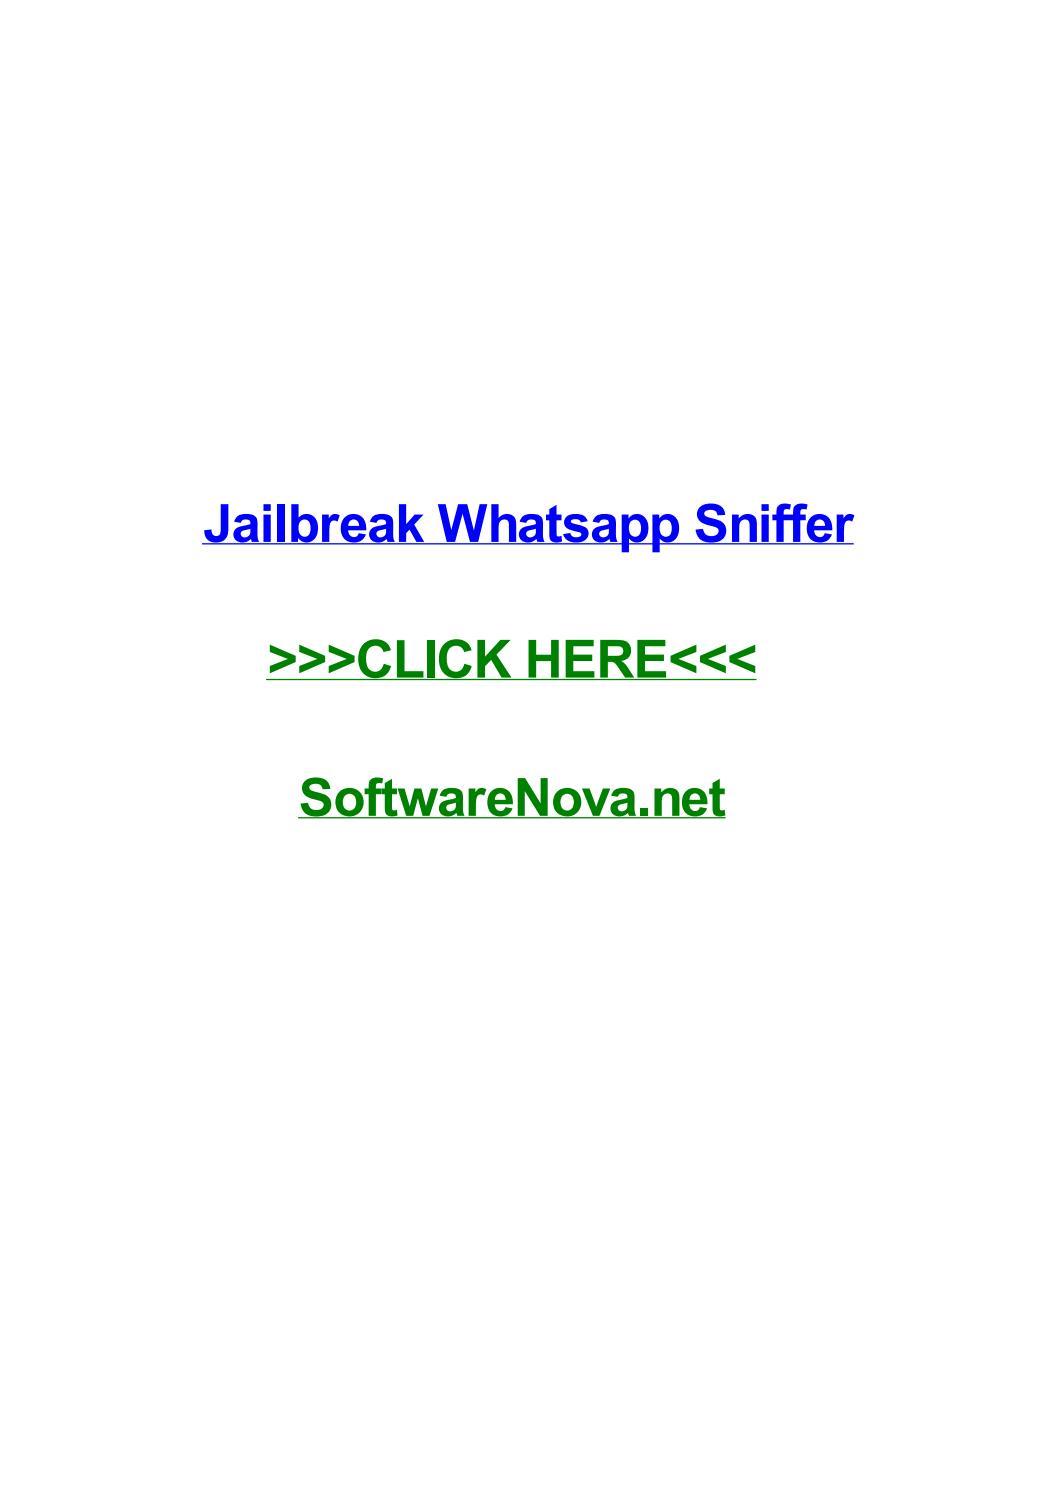 descargar whatsapp sniffer gratis para iphone 8 Plus